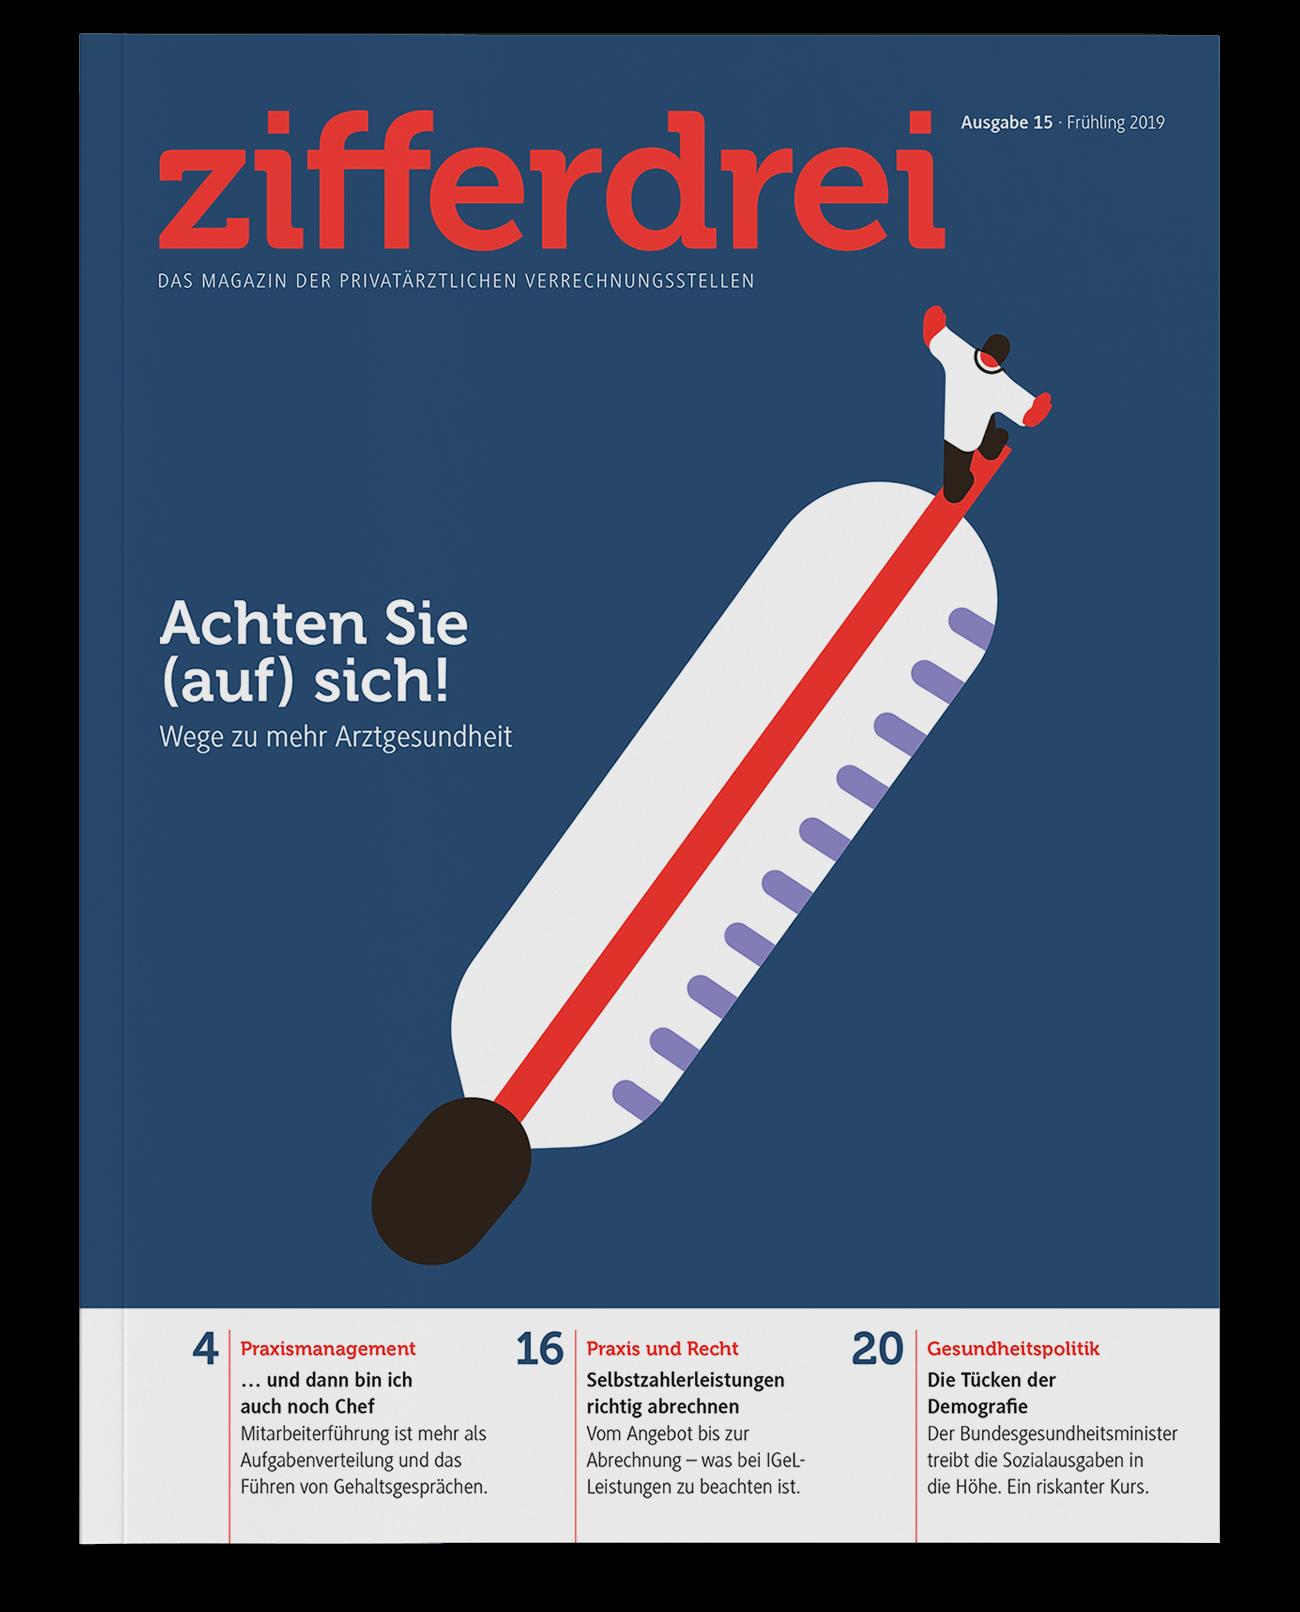 Take care! Zifferdrei